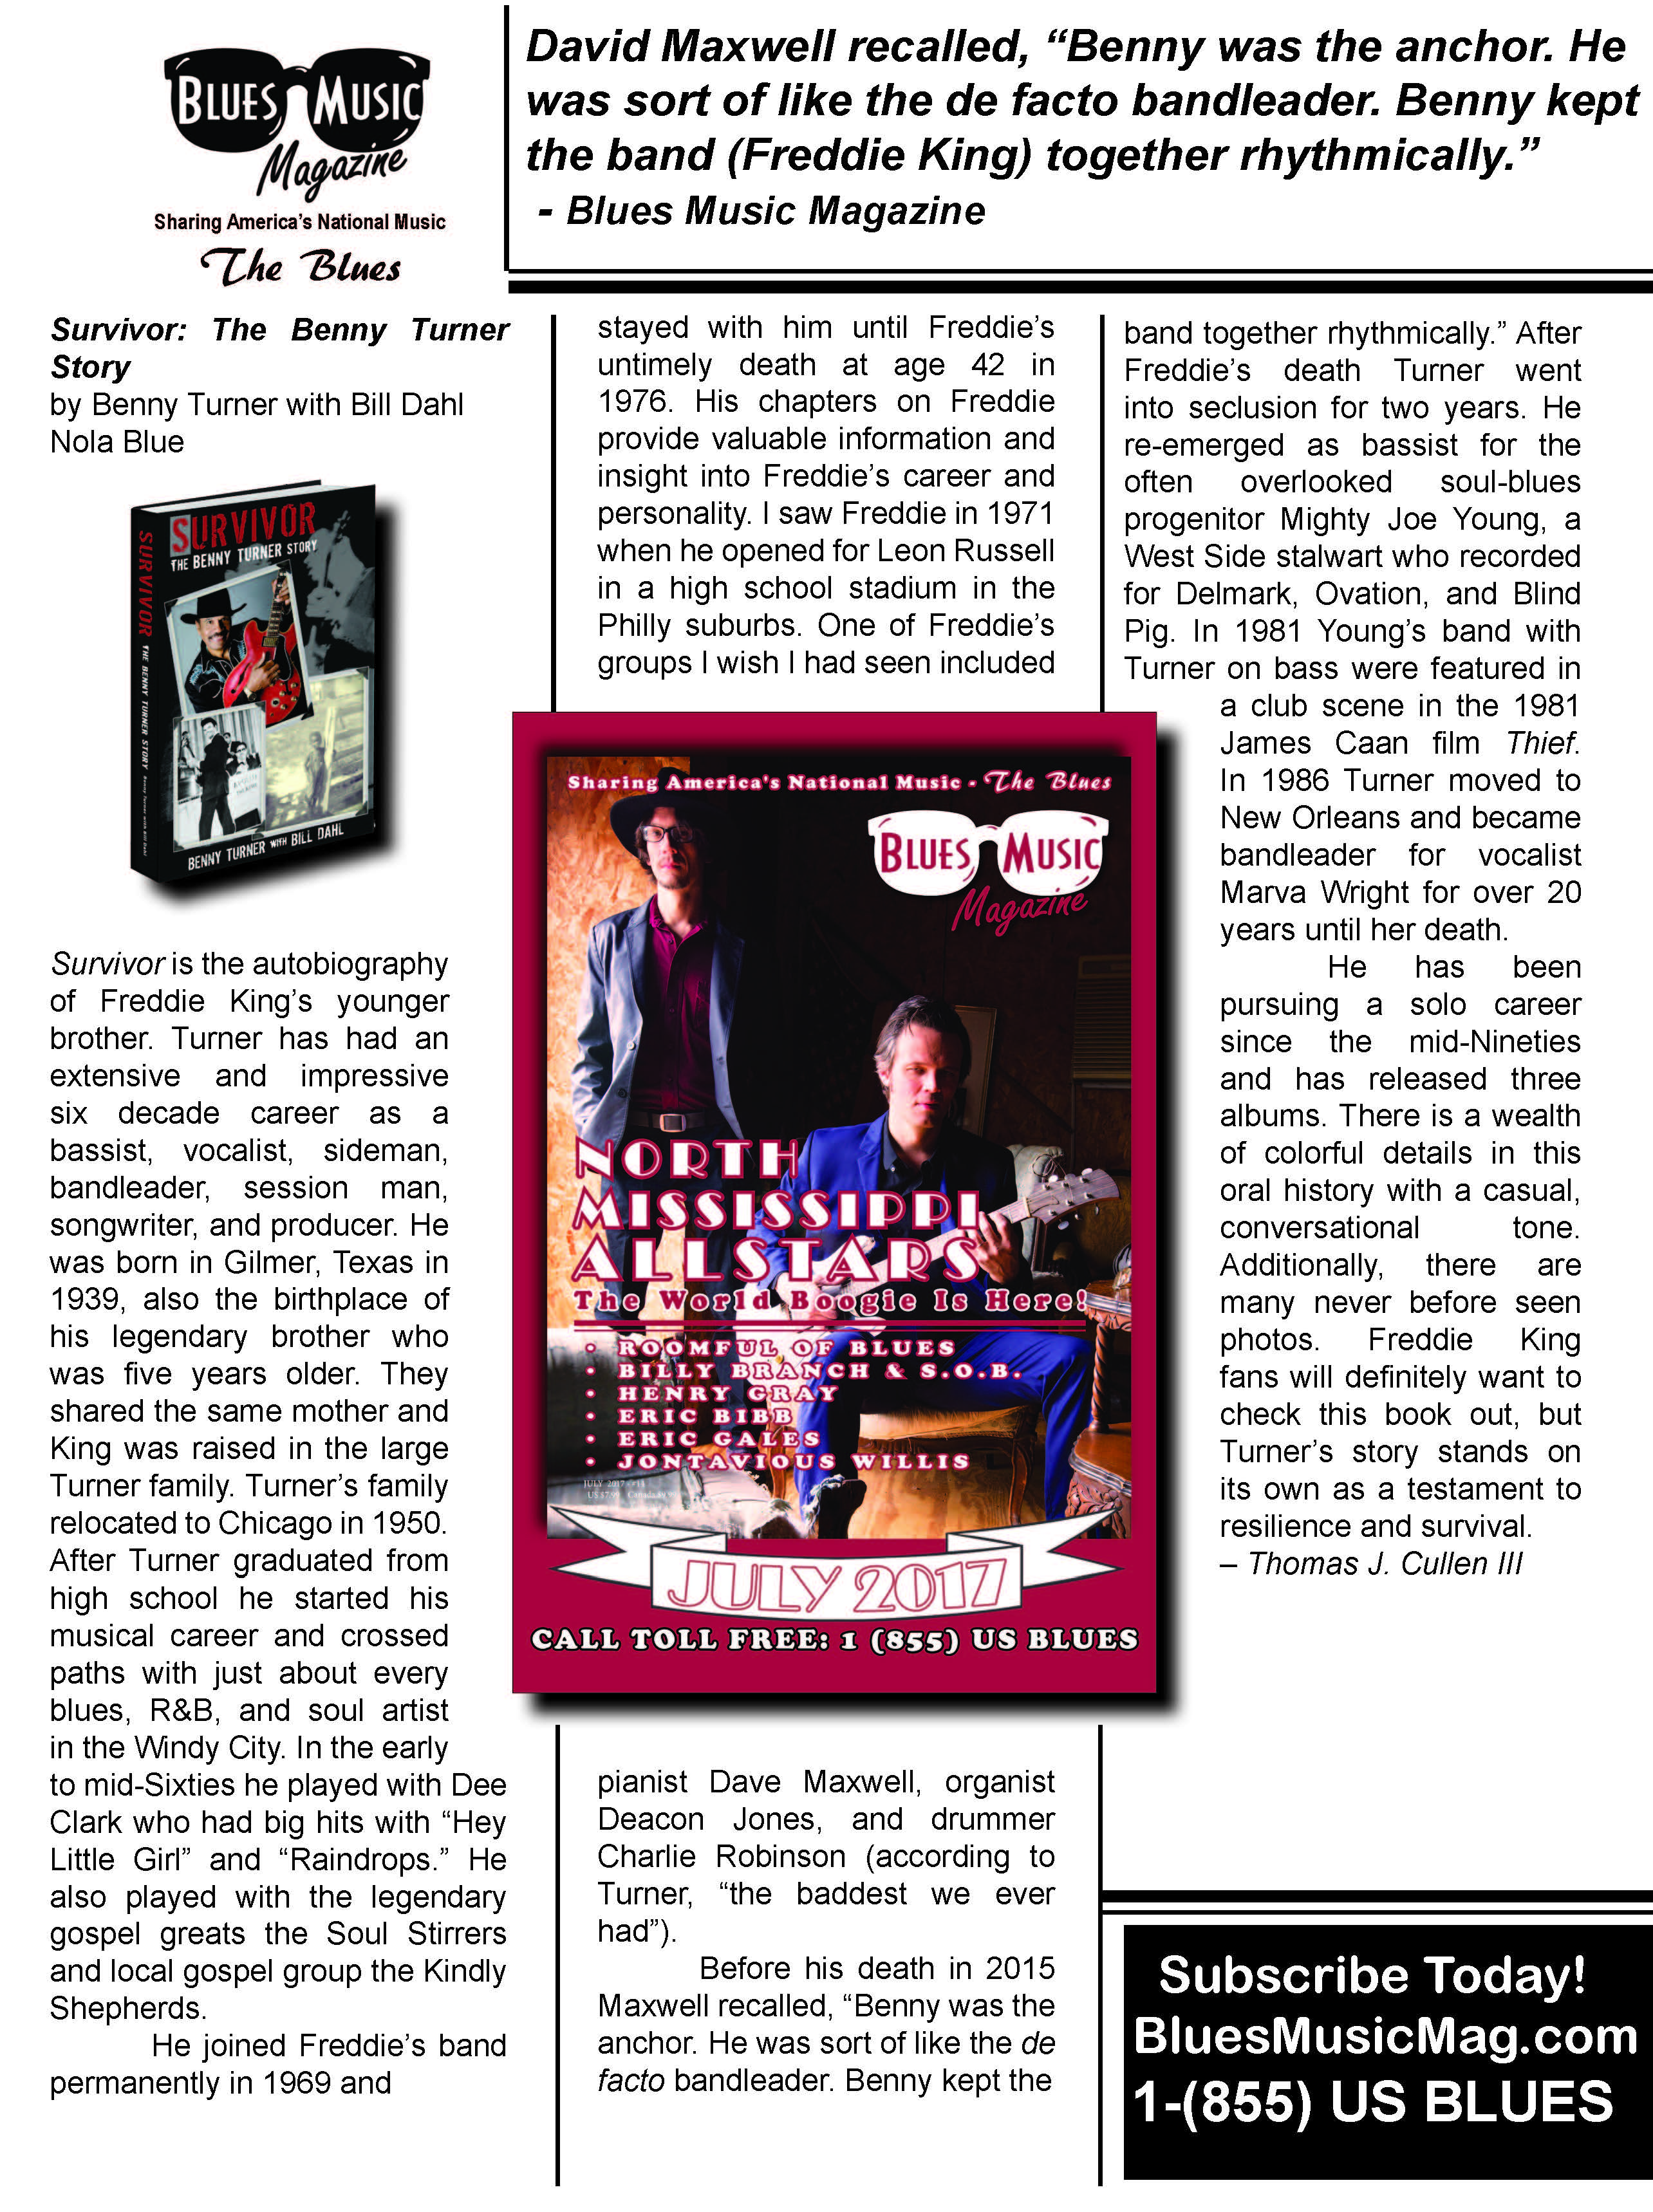 benny-turner-book-review-july-2017.jpg